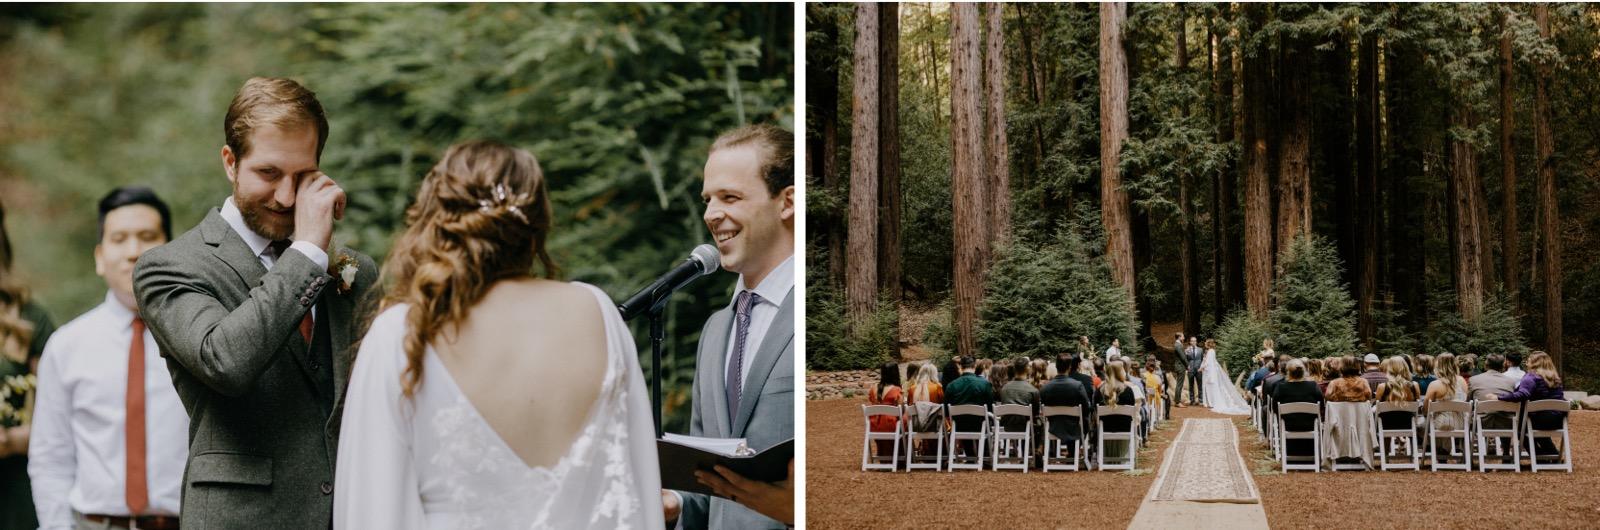 062_Emily & Jeff Wedding 0612_Emily & Jeff Wedding 0611_the-waterfall-lodge_forest_wedding_ben-lomond_intimate